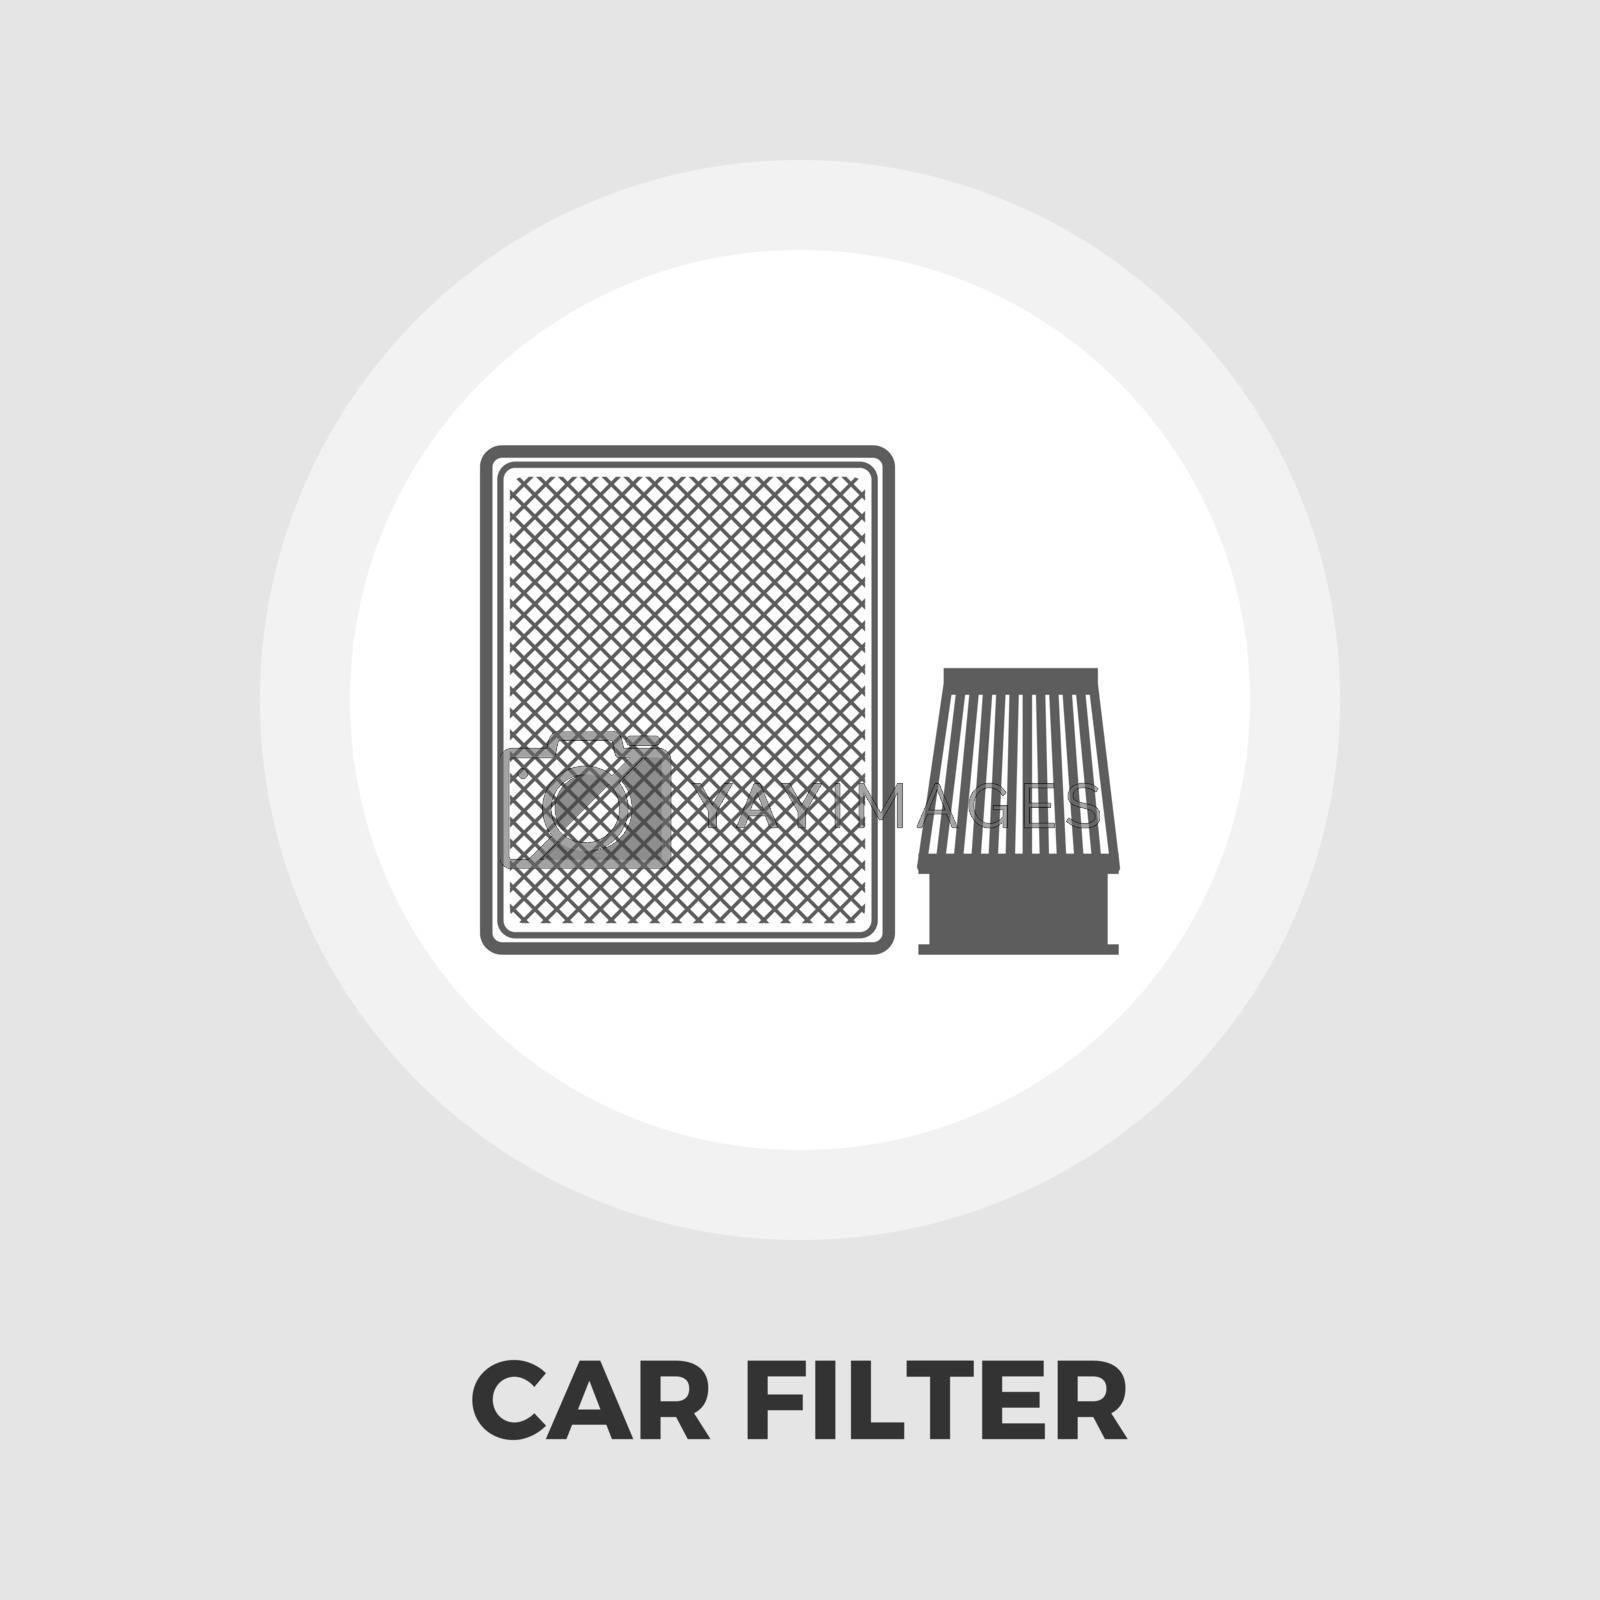 Automotive filter flat icon by smoki